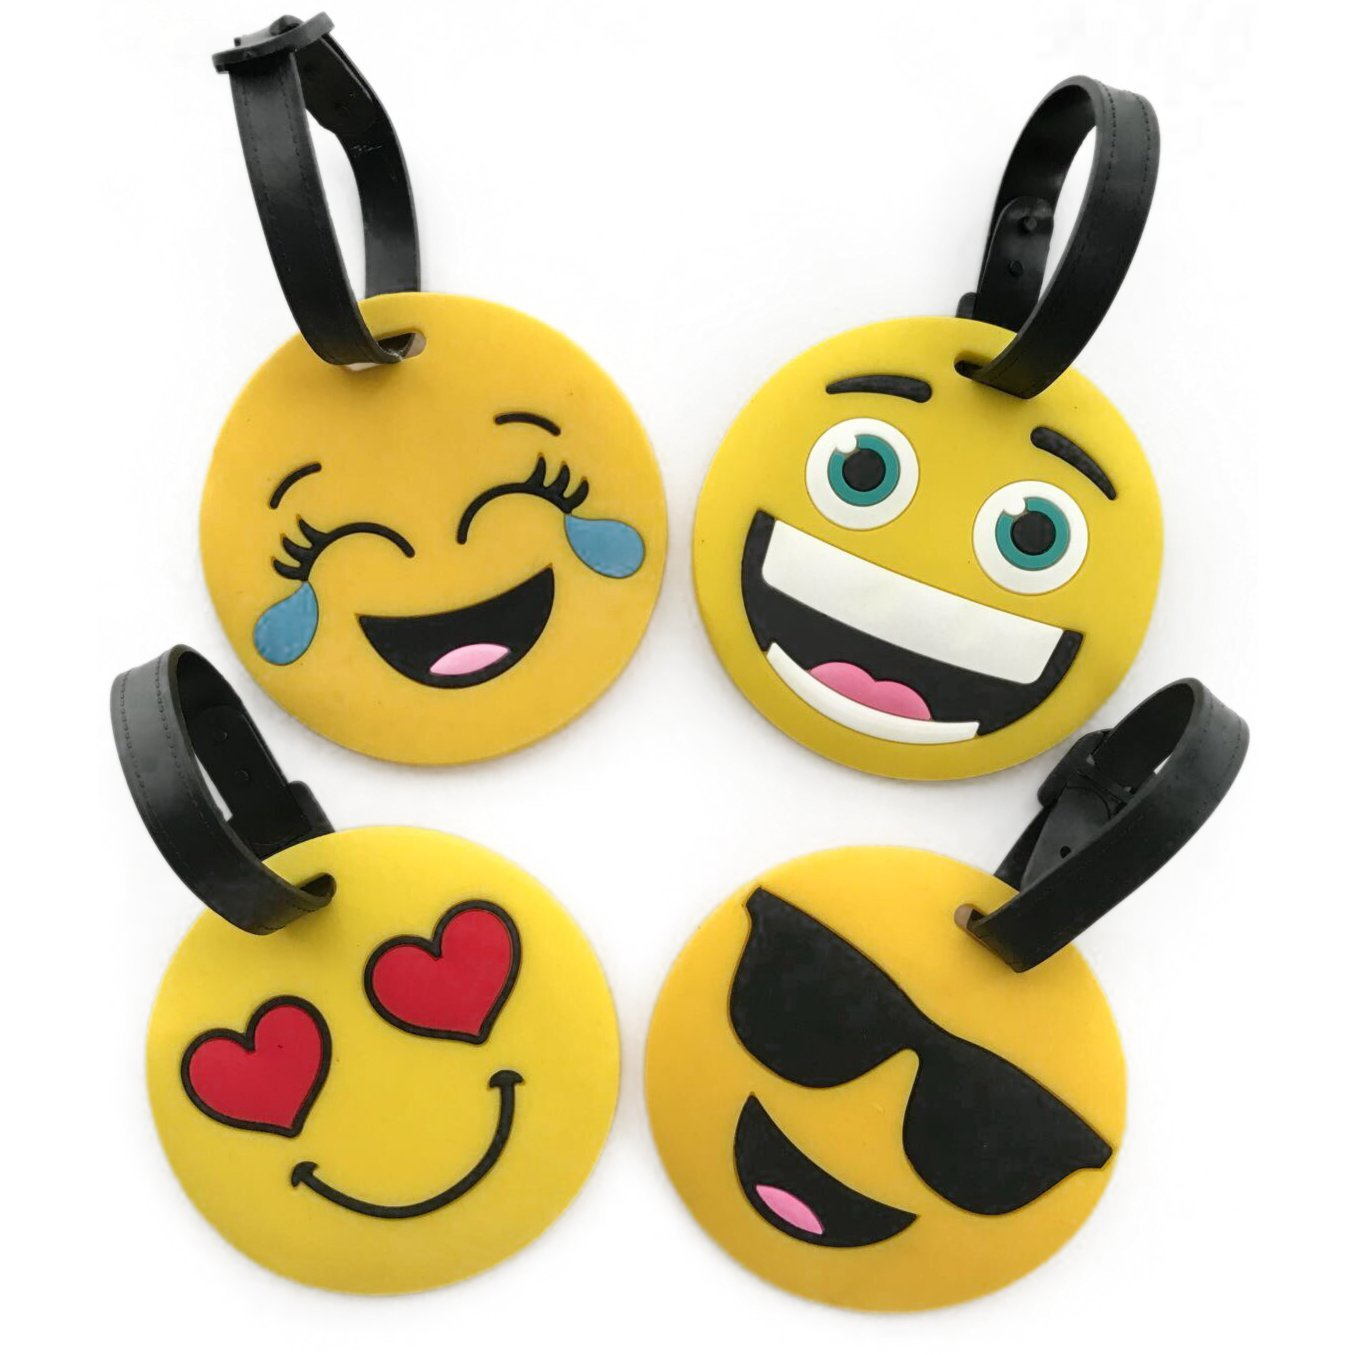 4 packs Emoji luggage tags